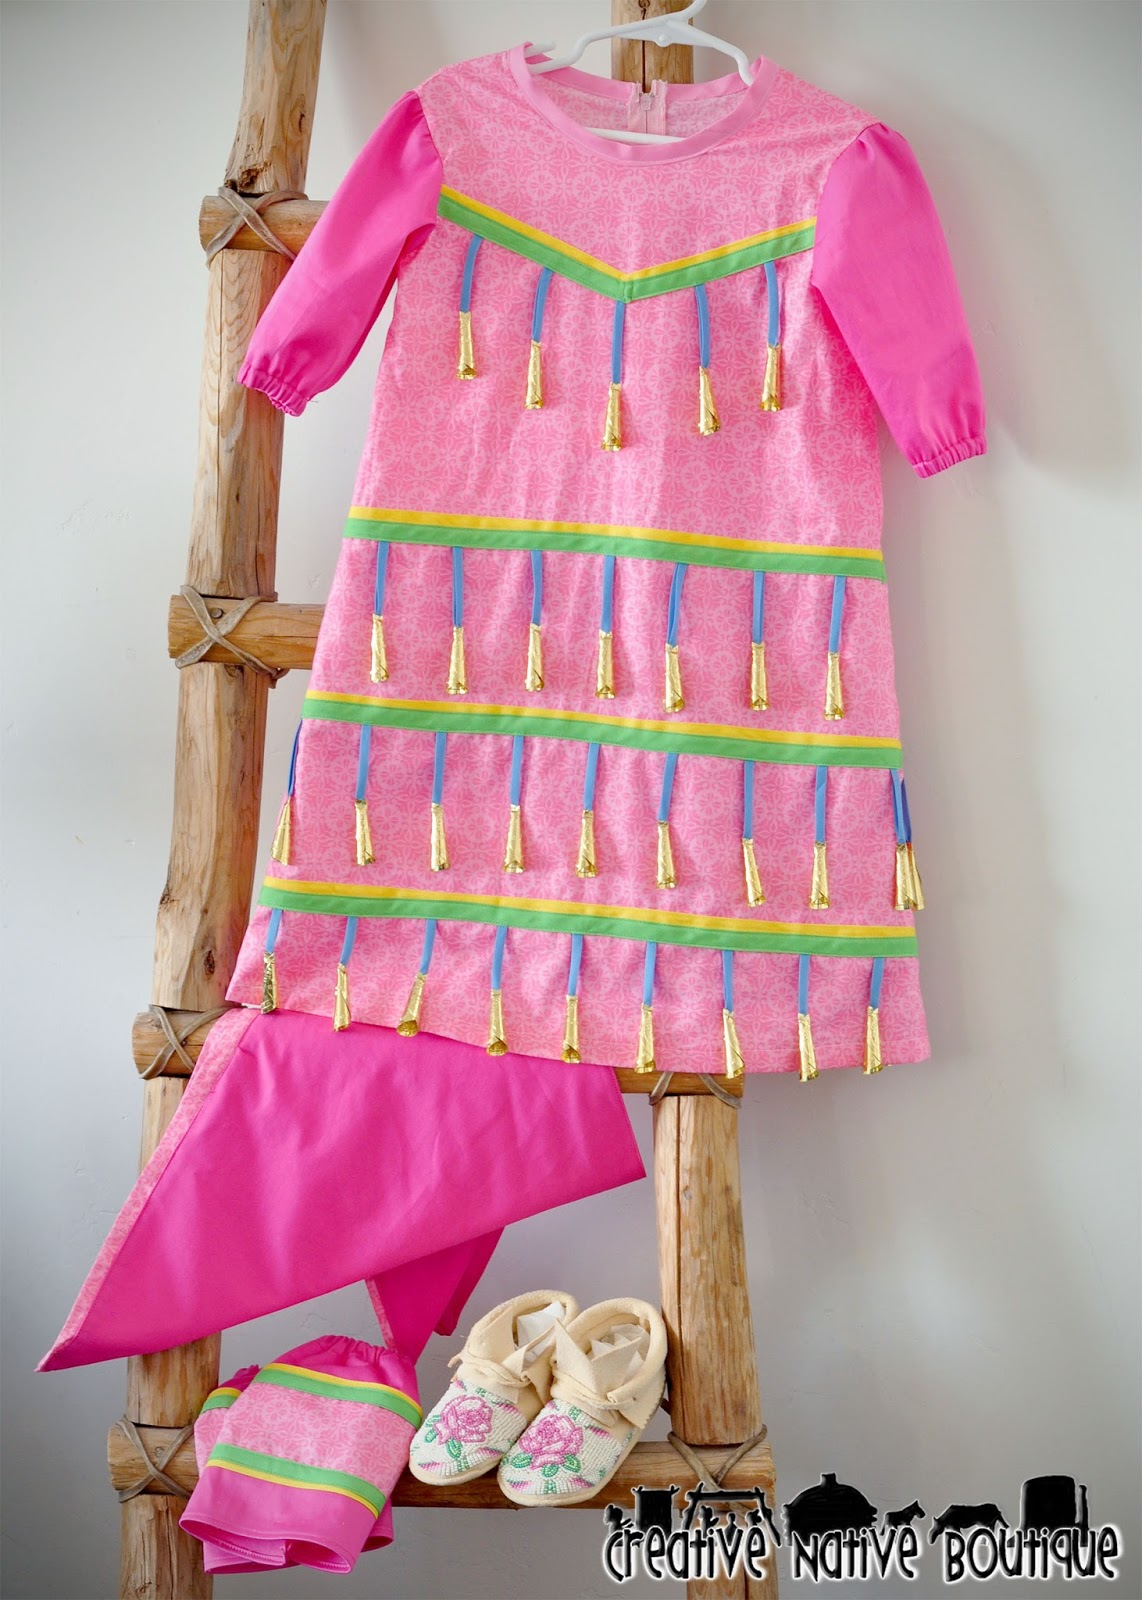 creative boutique custom s jingle dress